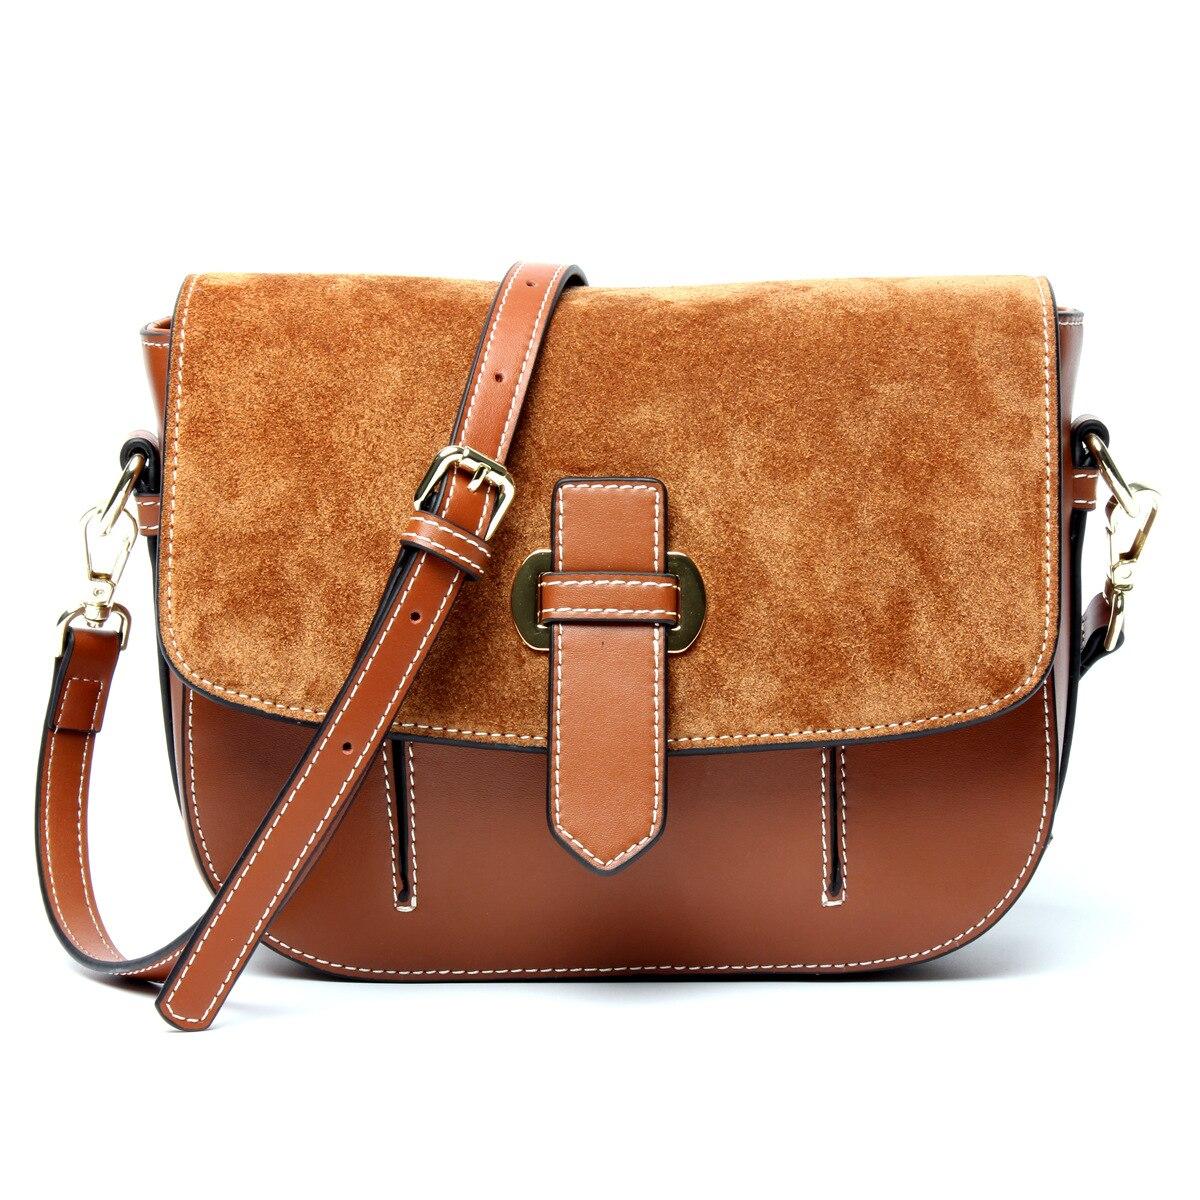 ФОТО New Europe Fashion Womens Bags Luxury Leather Famous Brands Design Handbag Women Messenger Bags